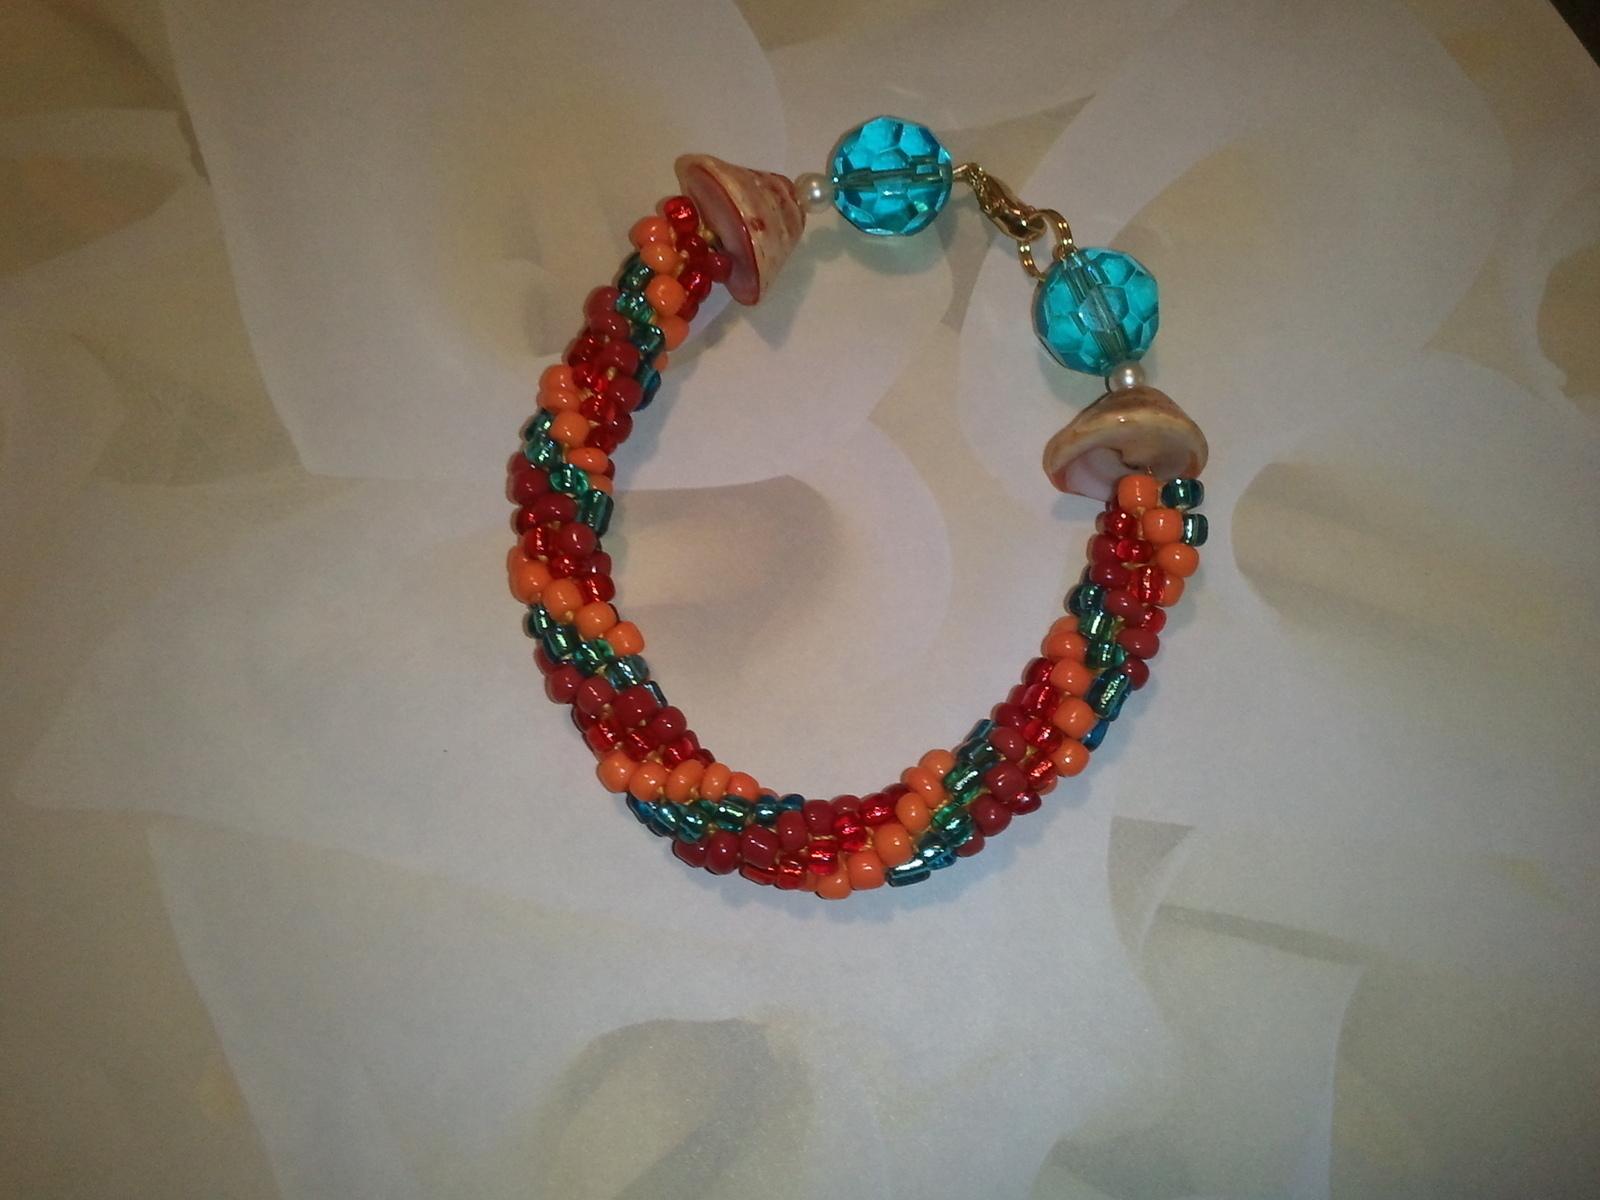 Tropical Beaded Crochet Bracelet How To Braid A Braided Bead